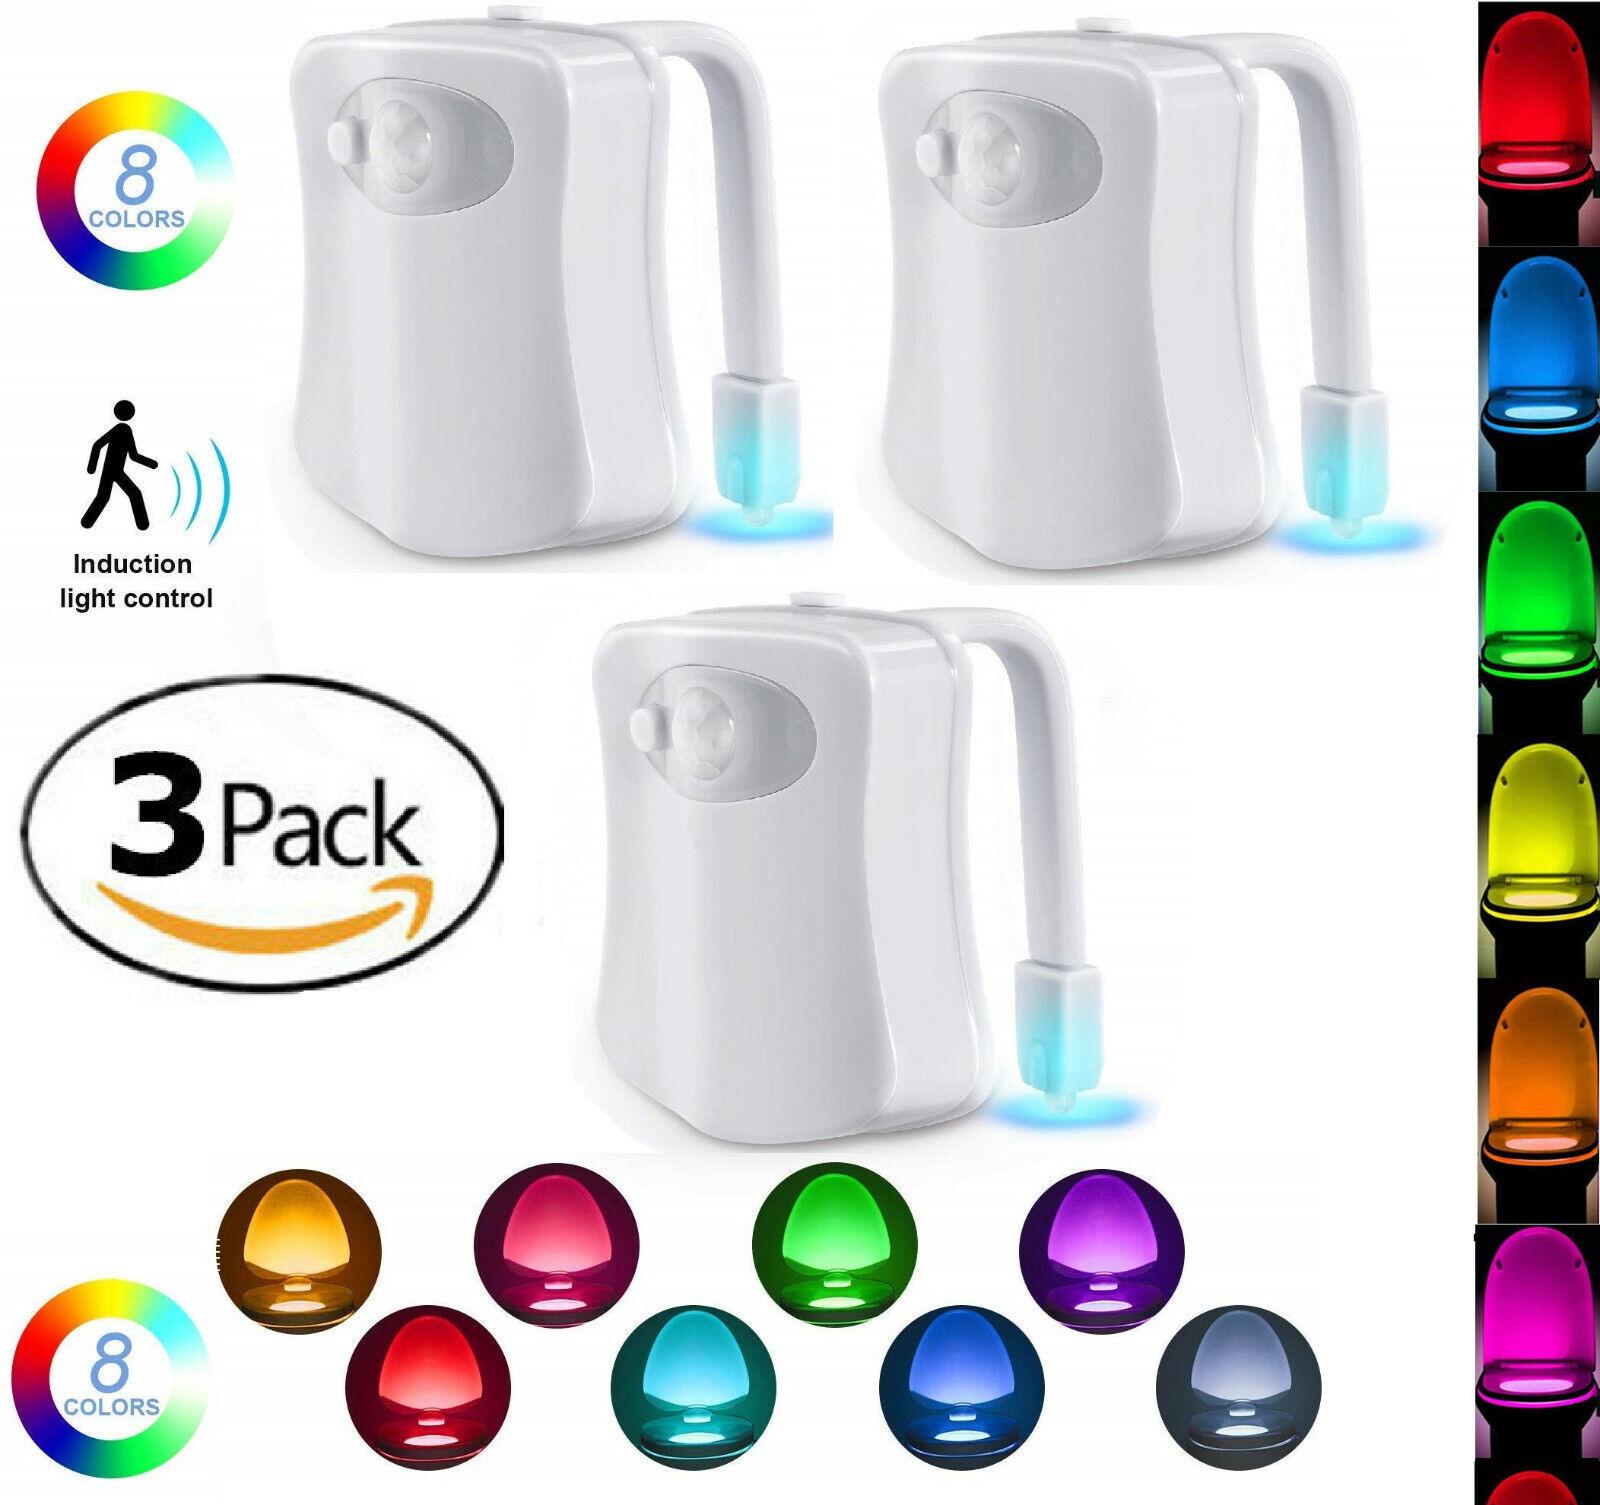 3 Pack Toilet Night Light 8 Color LED Motion Activated Sensor Bathroom Bowl Seat Home & Garden